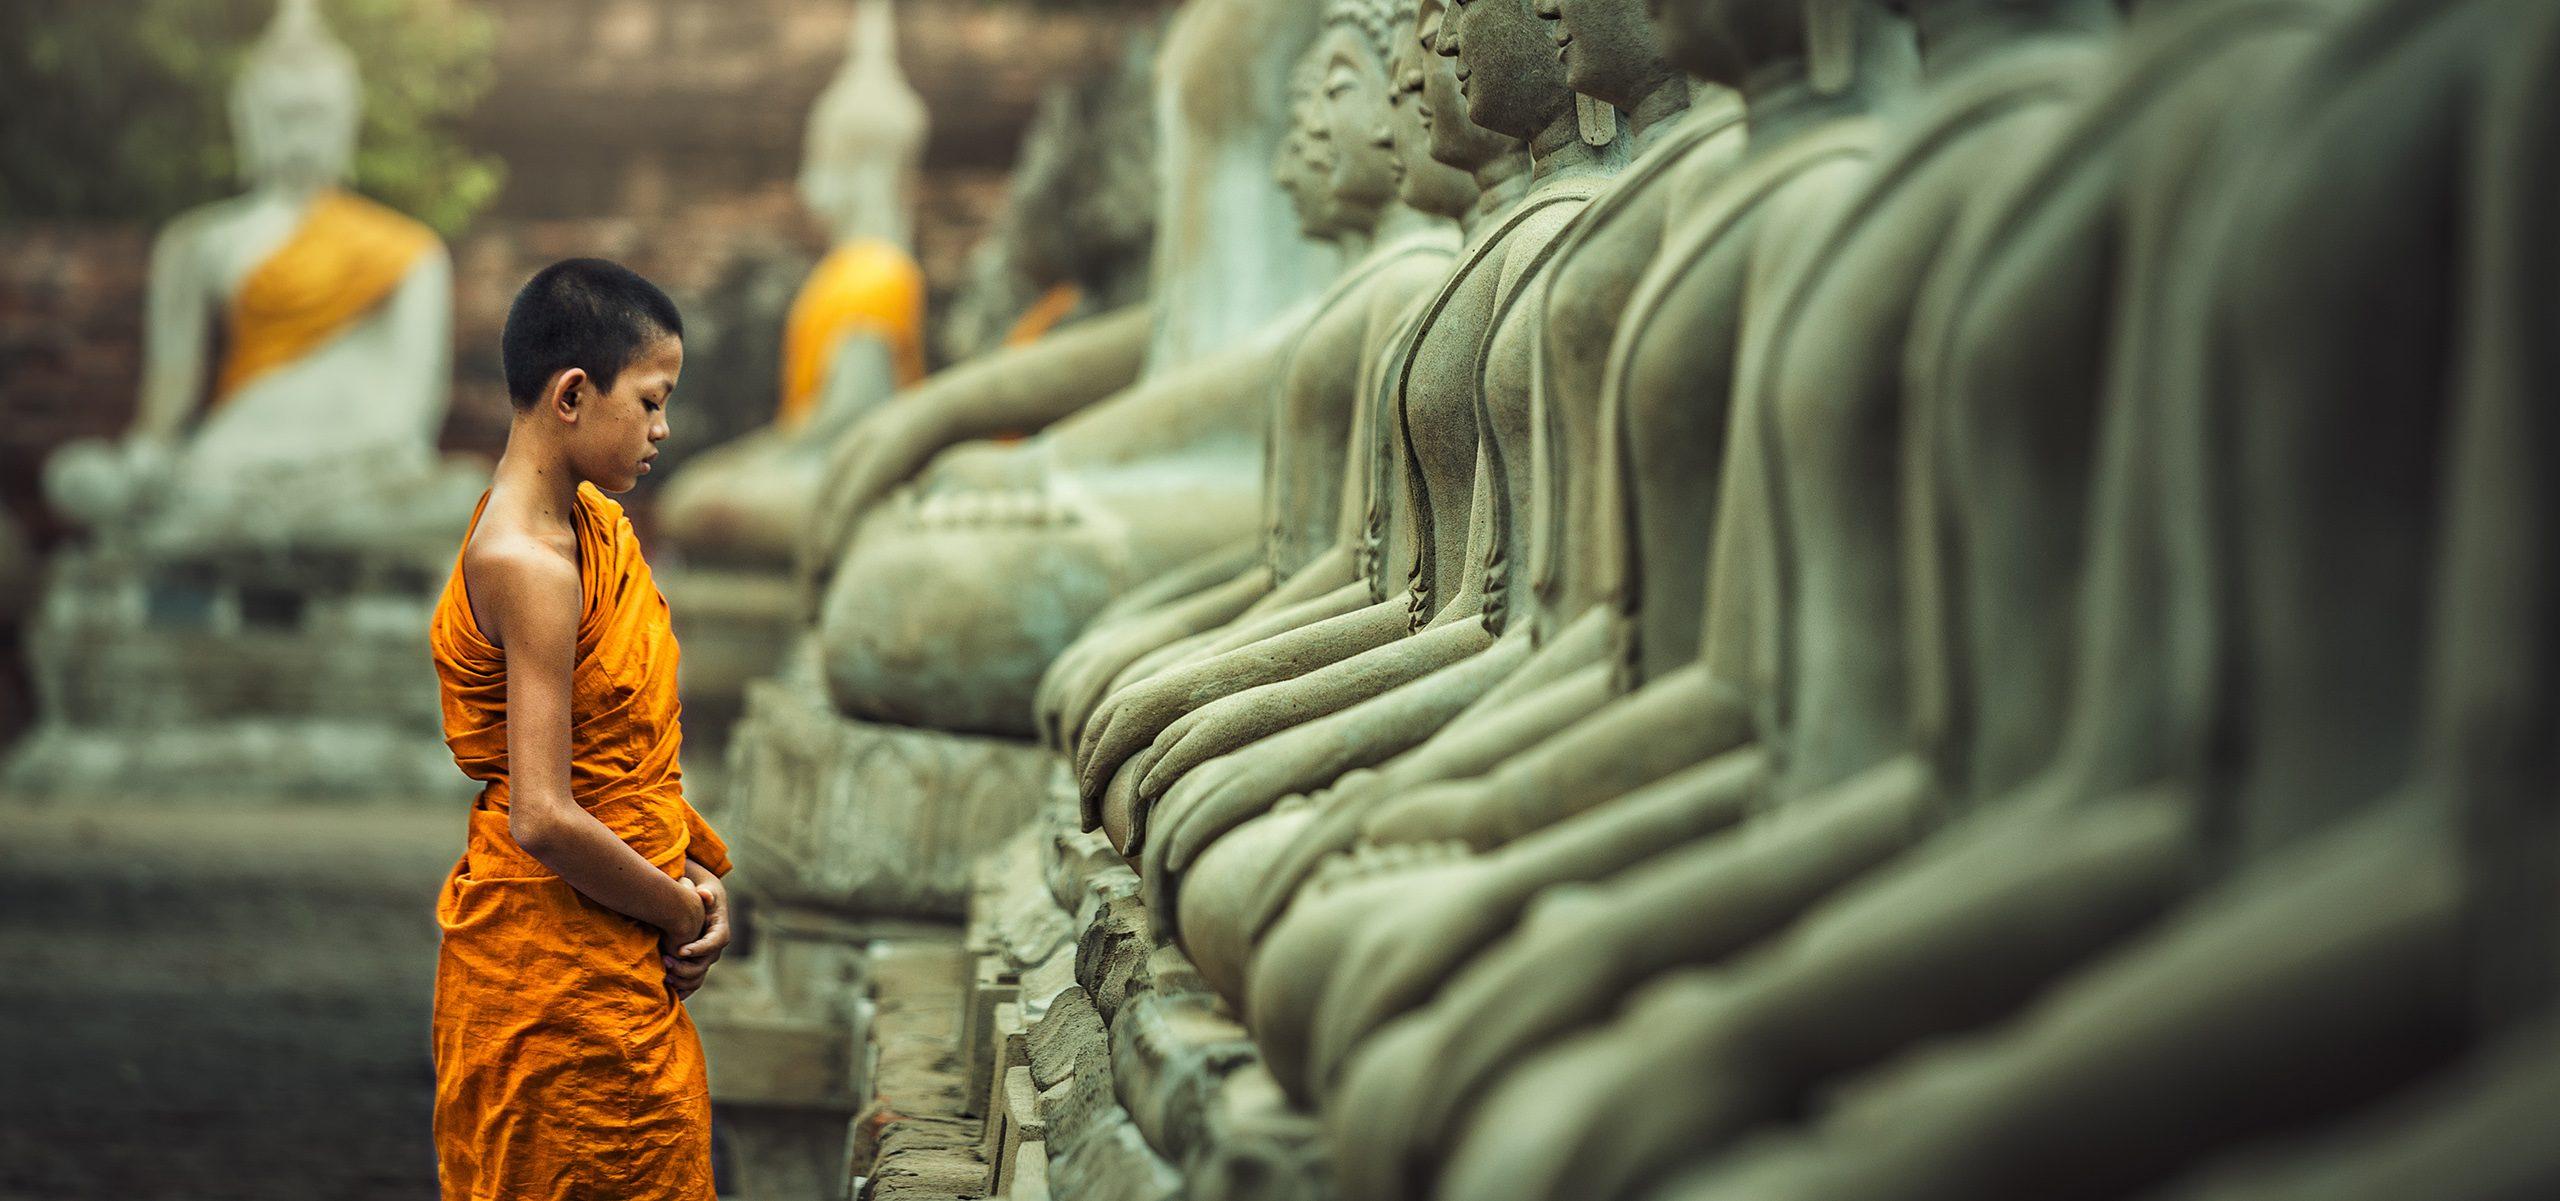 Laos-Luang Prabang-Statues